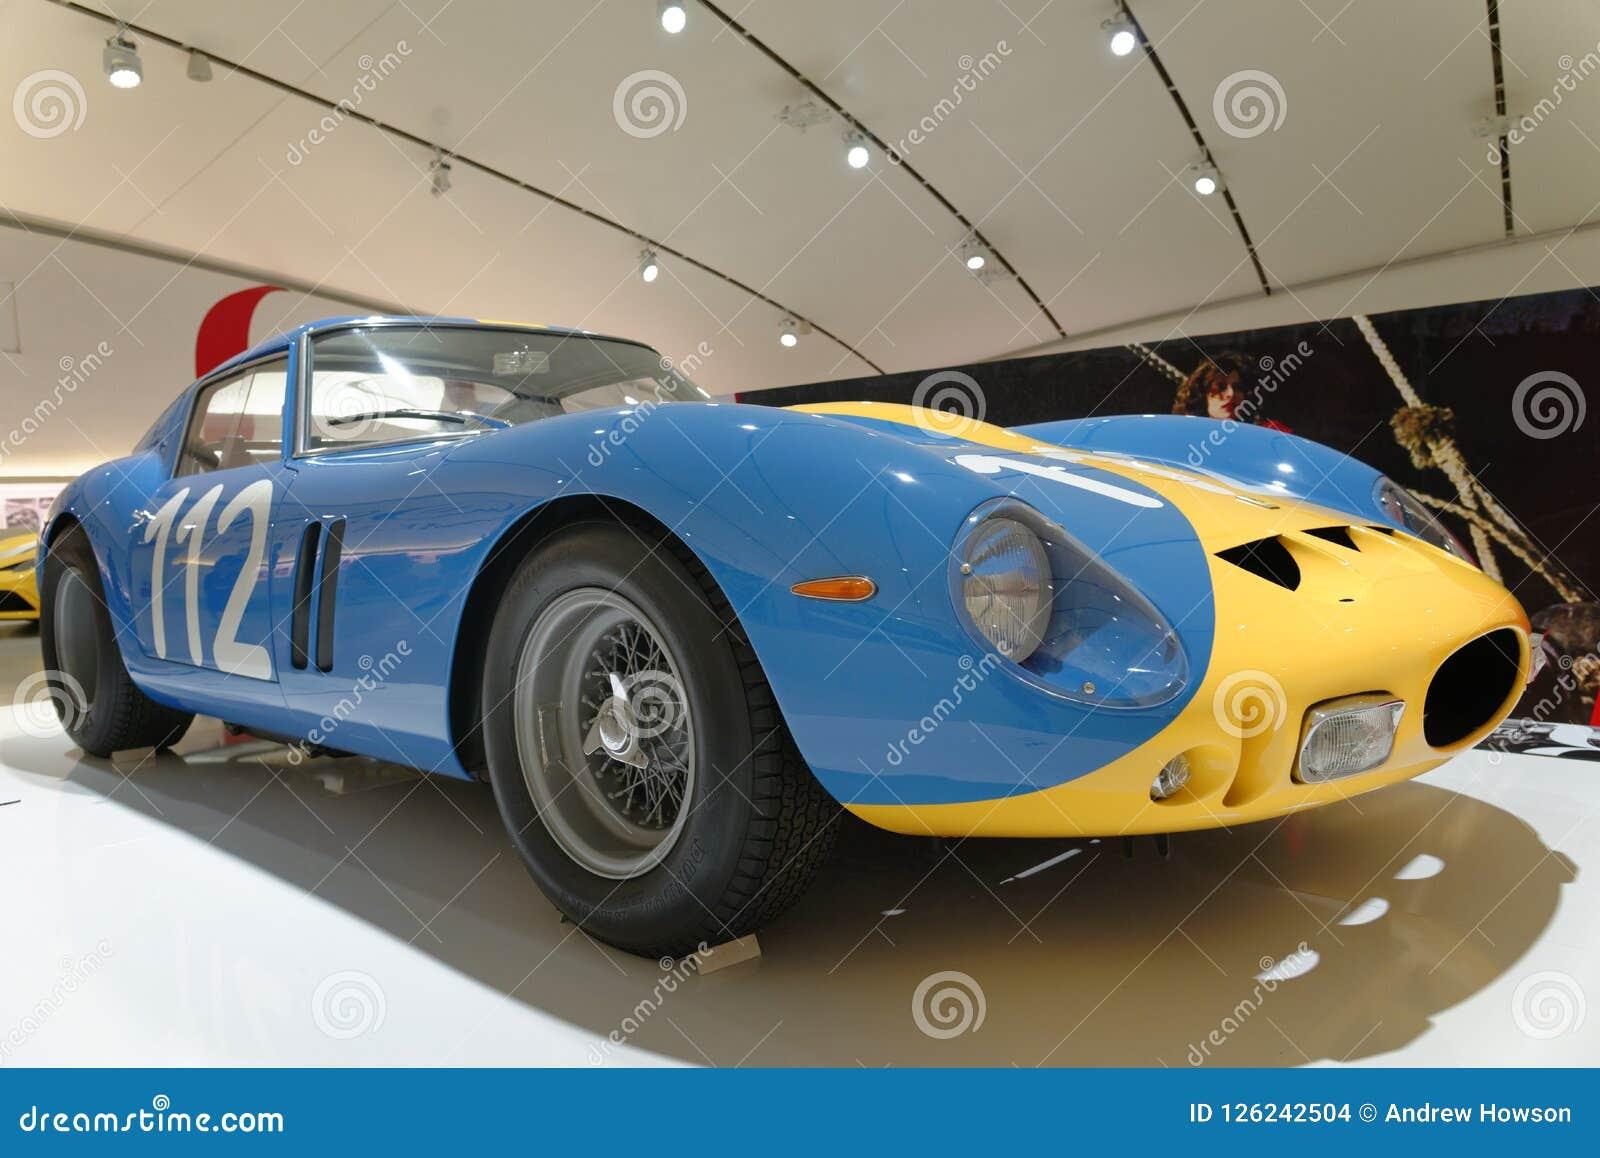 Maranello Italy Ferrari Vintage Sports Car Editorial Stock Image Image Of Architecture Antique 126242504